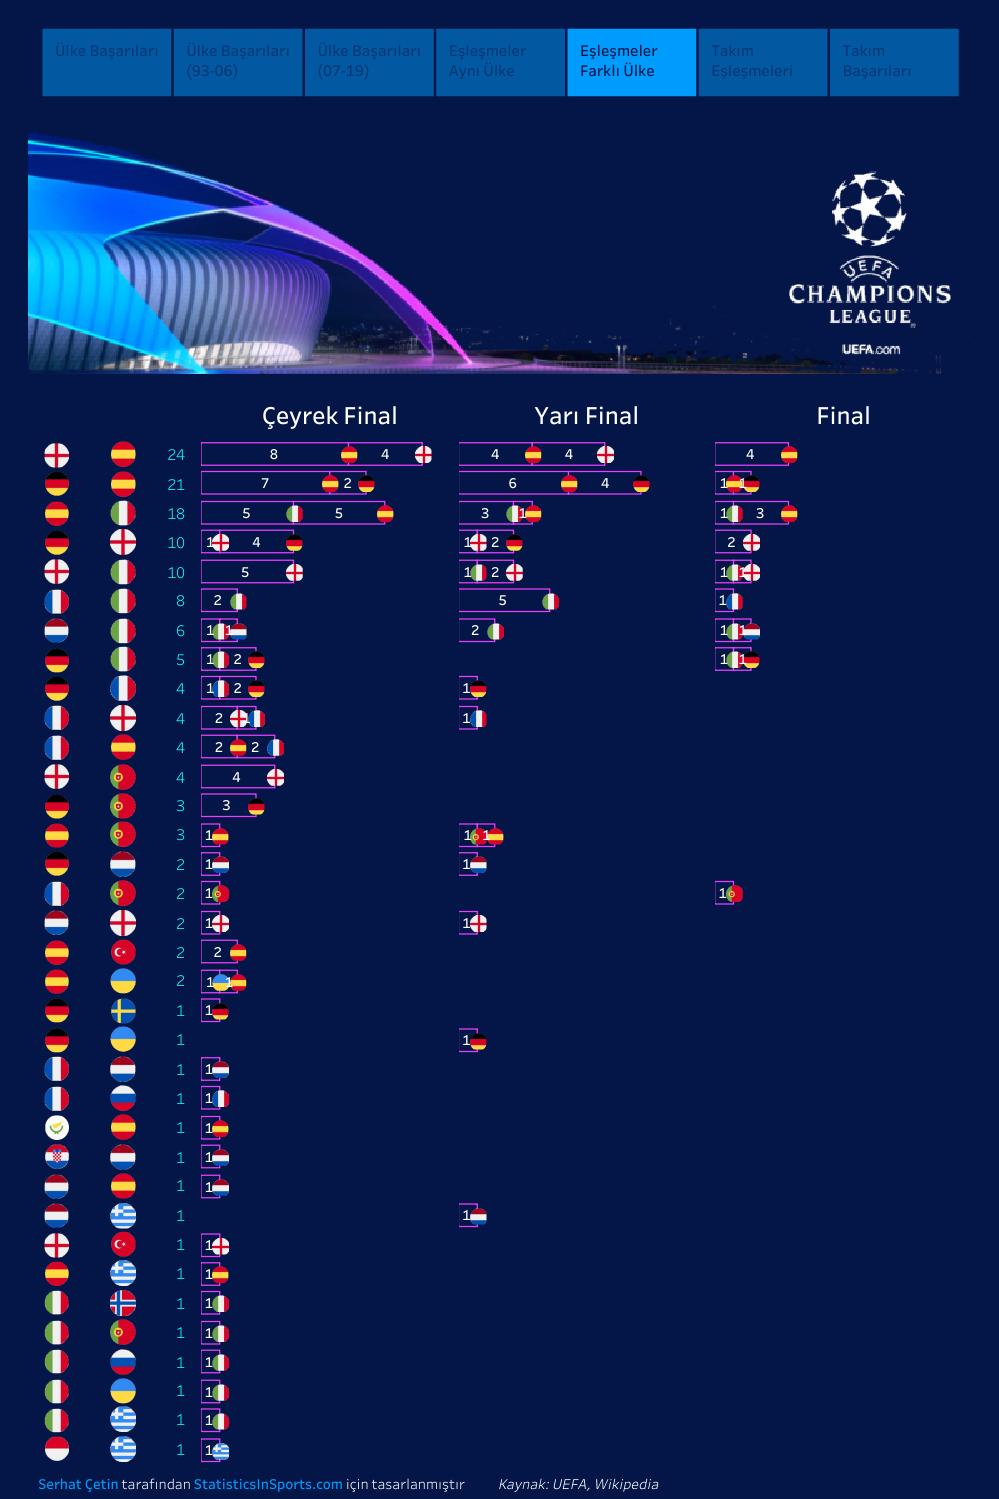 https://i.eurosport.com/2019/06/01/2603350.png